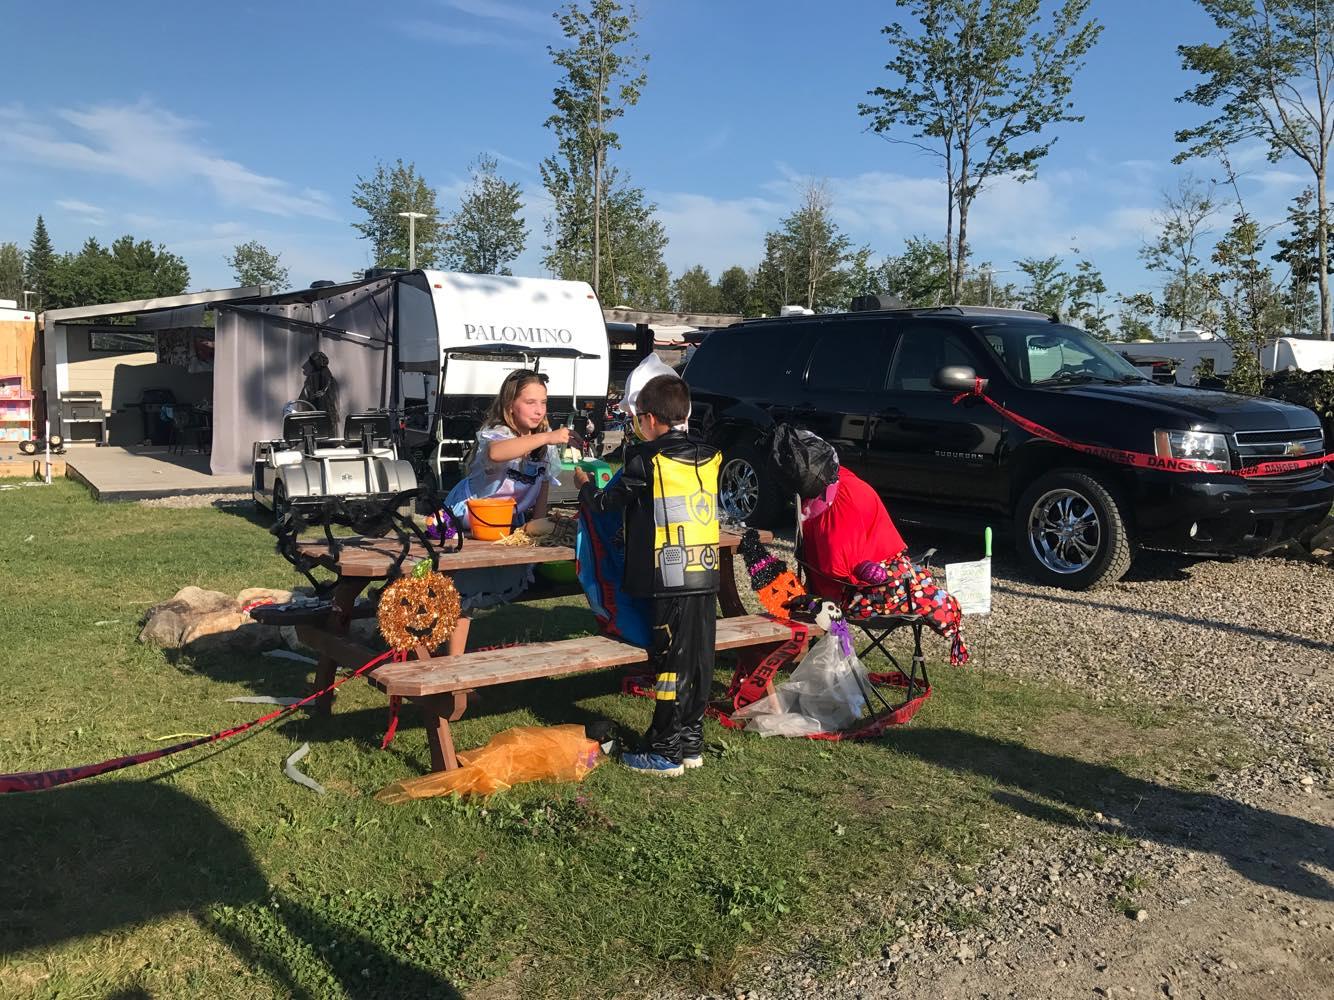 http://www.campingatlantide.com/wp-content/uploads/2018/08/halloween-complexe-atlantide-2018-1.jpg